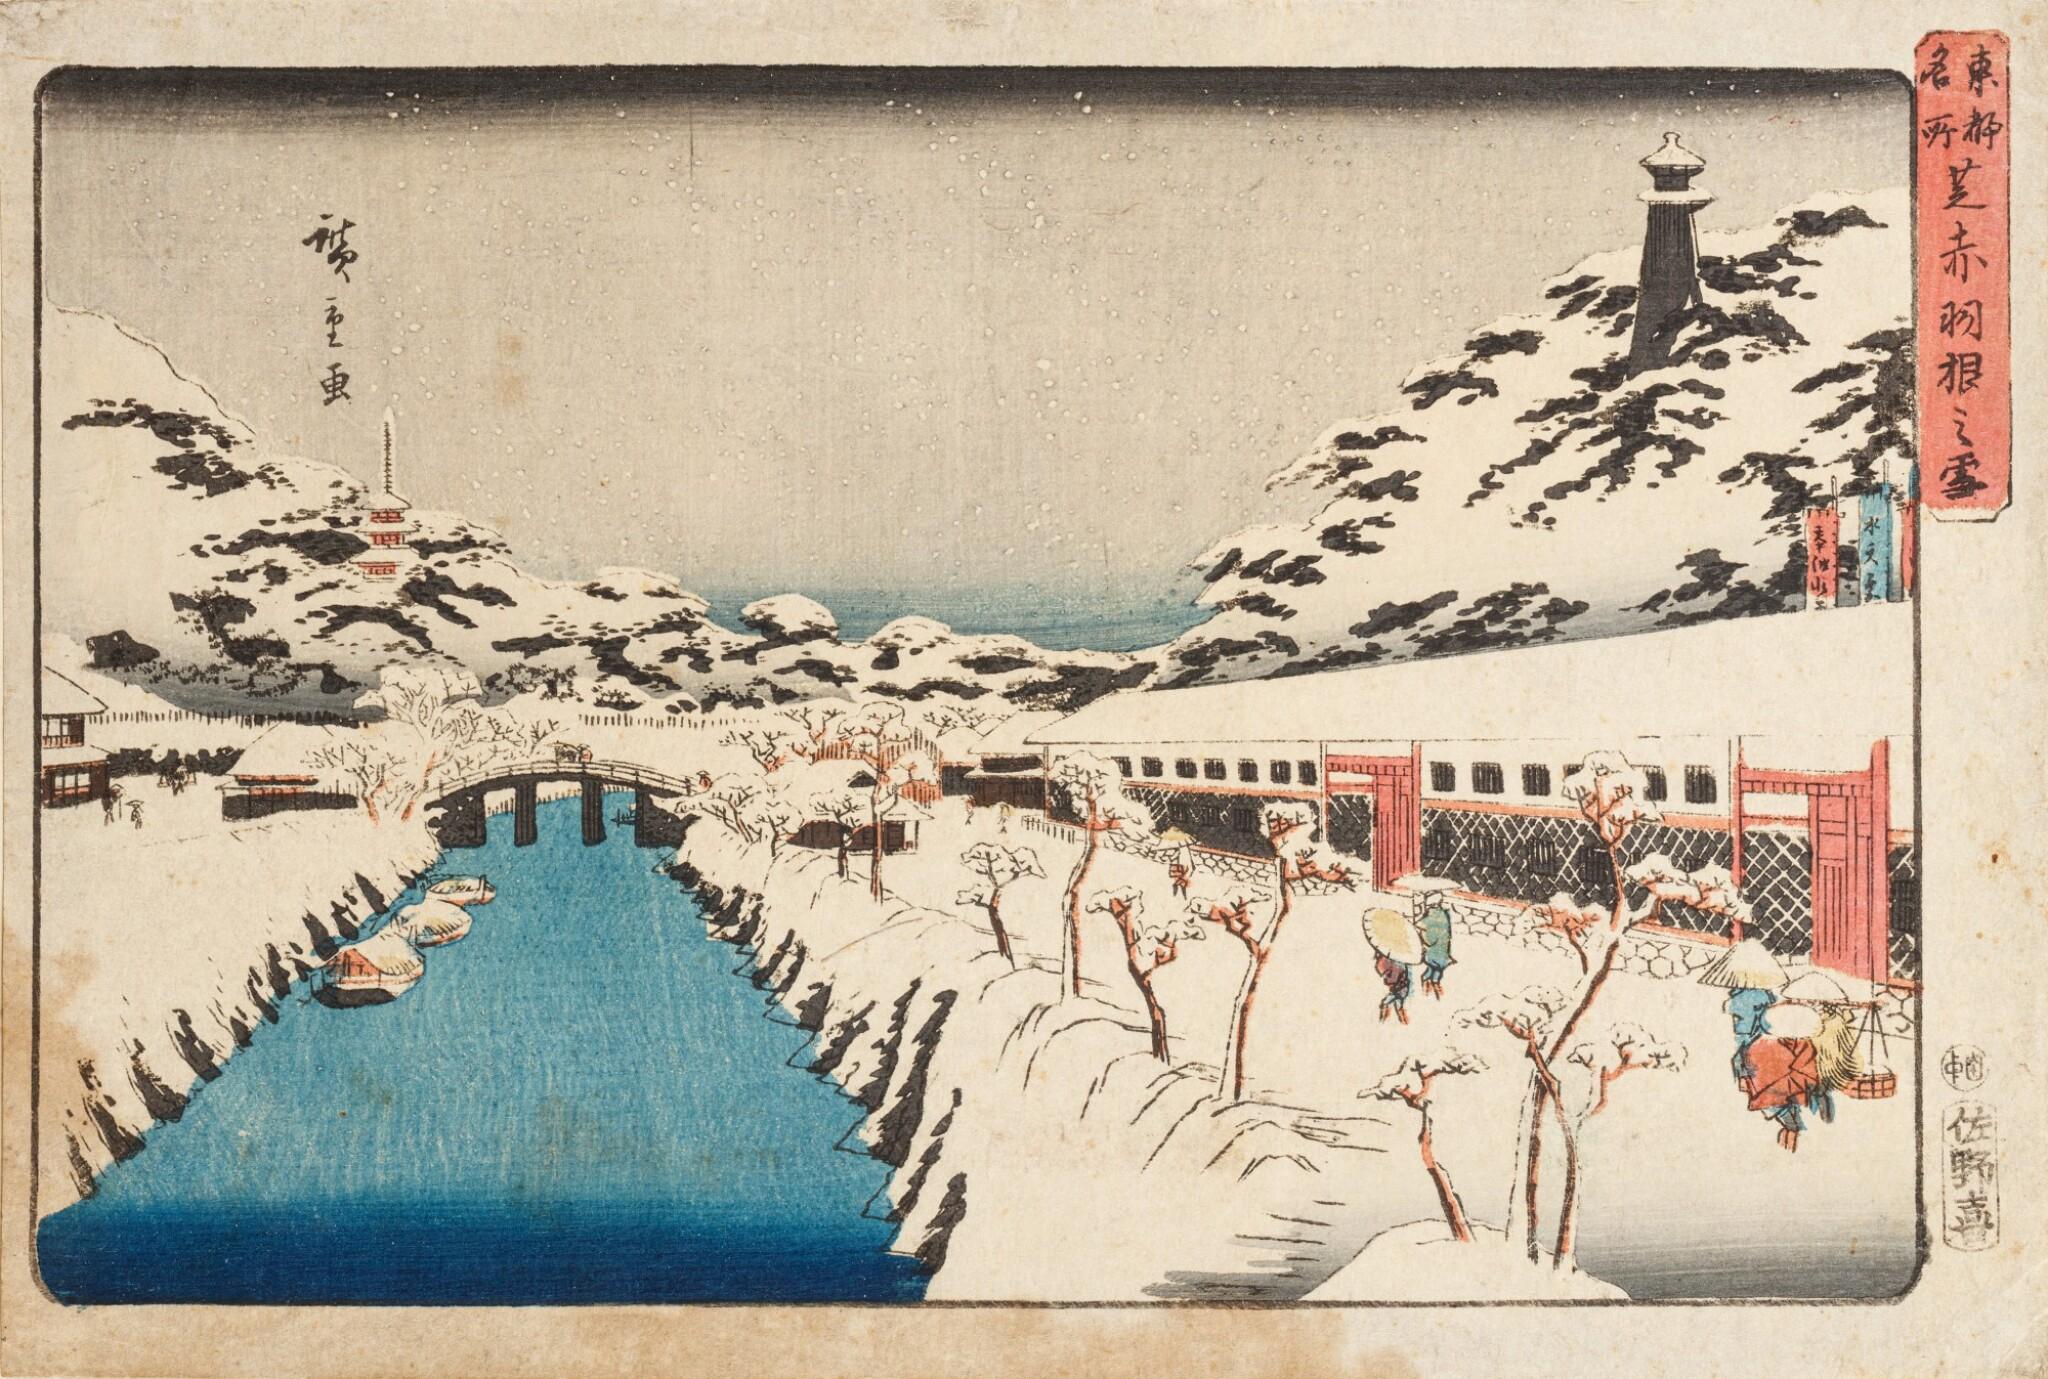 View 1 of Lot 270. Ando Hiroshige Japon | 日本 歌川広重 《東海道五拾三次之内・沼津・黄昏圖》、 《江都名所・御殿山遊興》、 《東都名所・芝赤羽根之雪》 | Ando Hiroshige, three prints from various series: Numazu (Numazu, tasogare zu) from the series Fifty-three Stations of the Tokaido, ca. 1833-1834 ; Snow at Akabane Bridge in Shiba, from the series Famous Places of the Eastern Capital, ca. 1837; Cherry blossoms at Goten-yama, from the series Famous Places in Edo, ca. 132-1834.